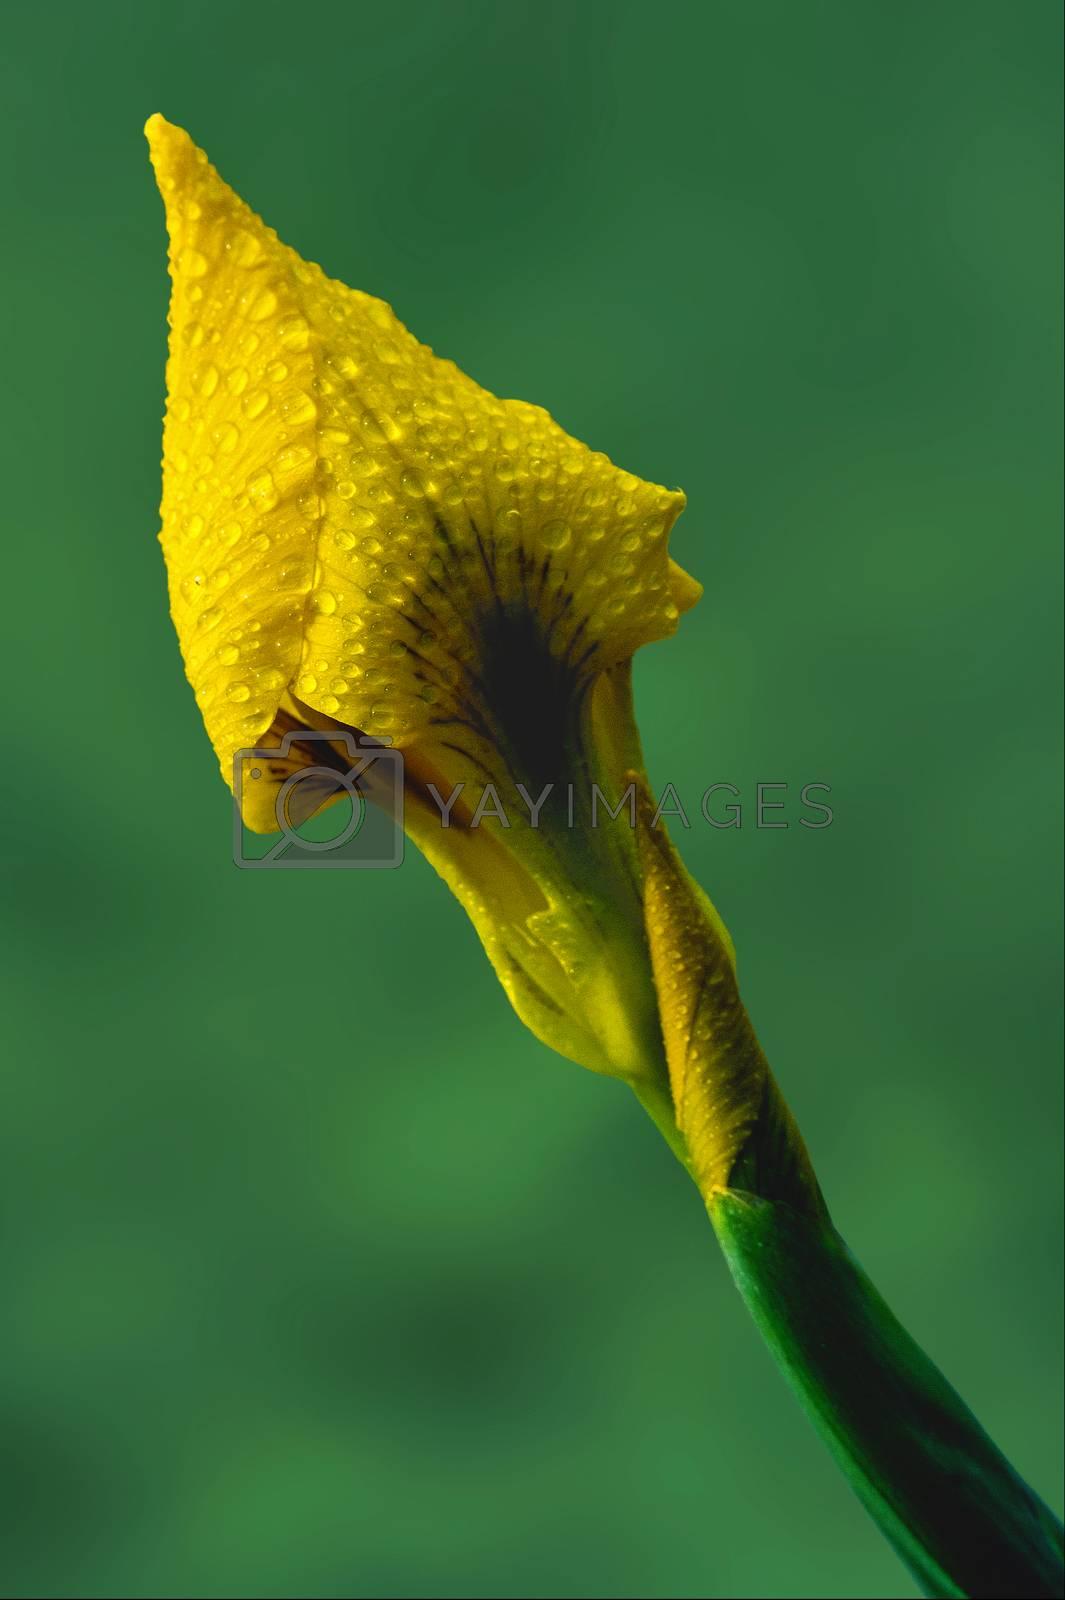 Royalty free image of close up of a  iridacee by lkpro